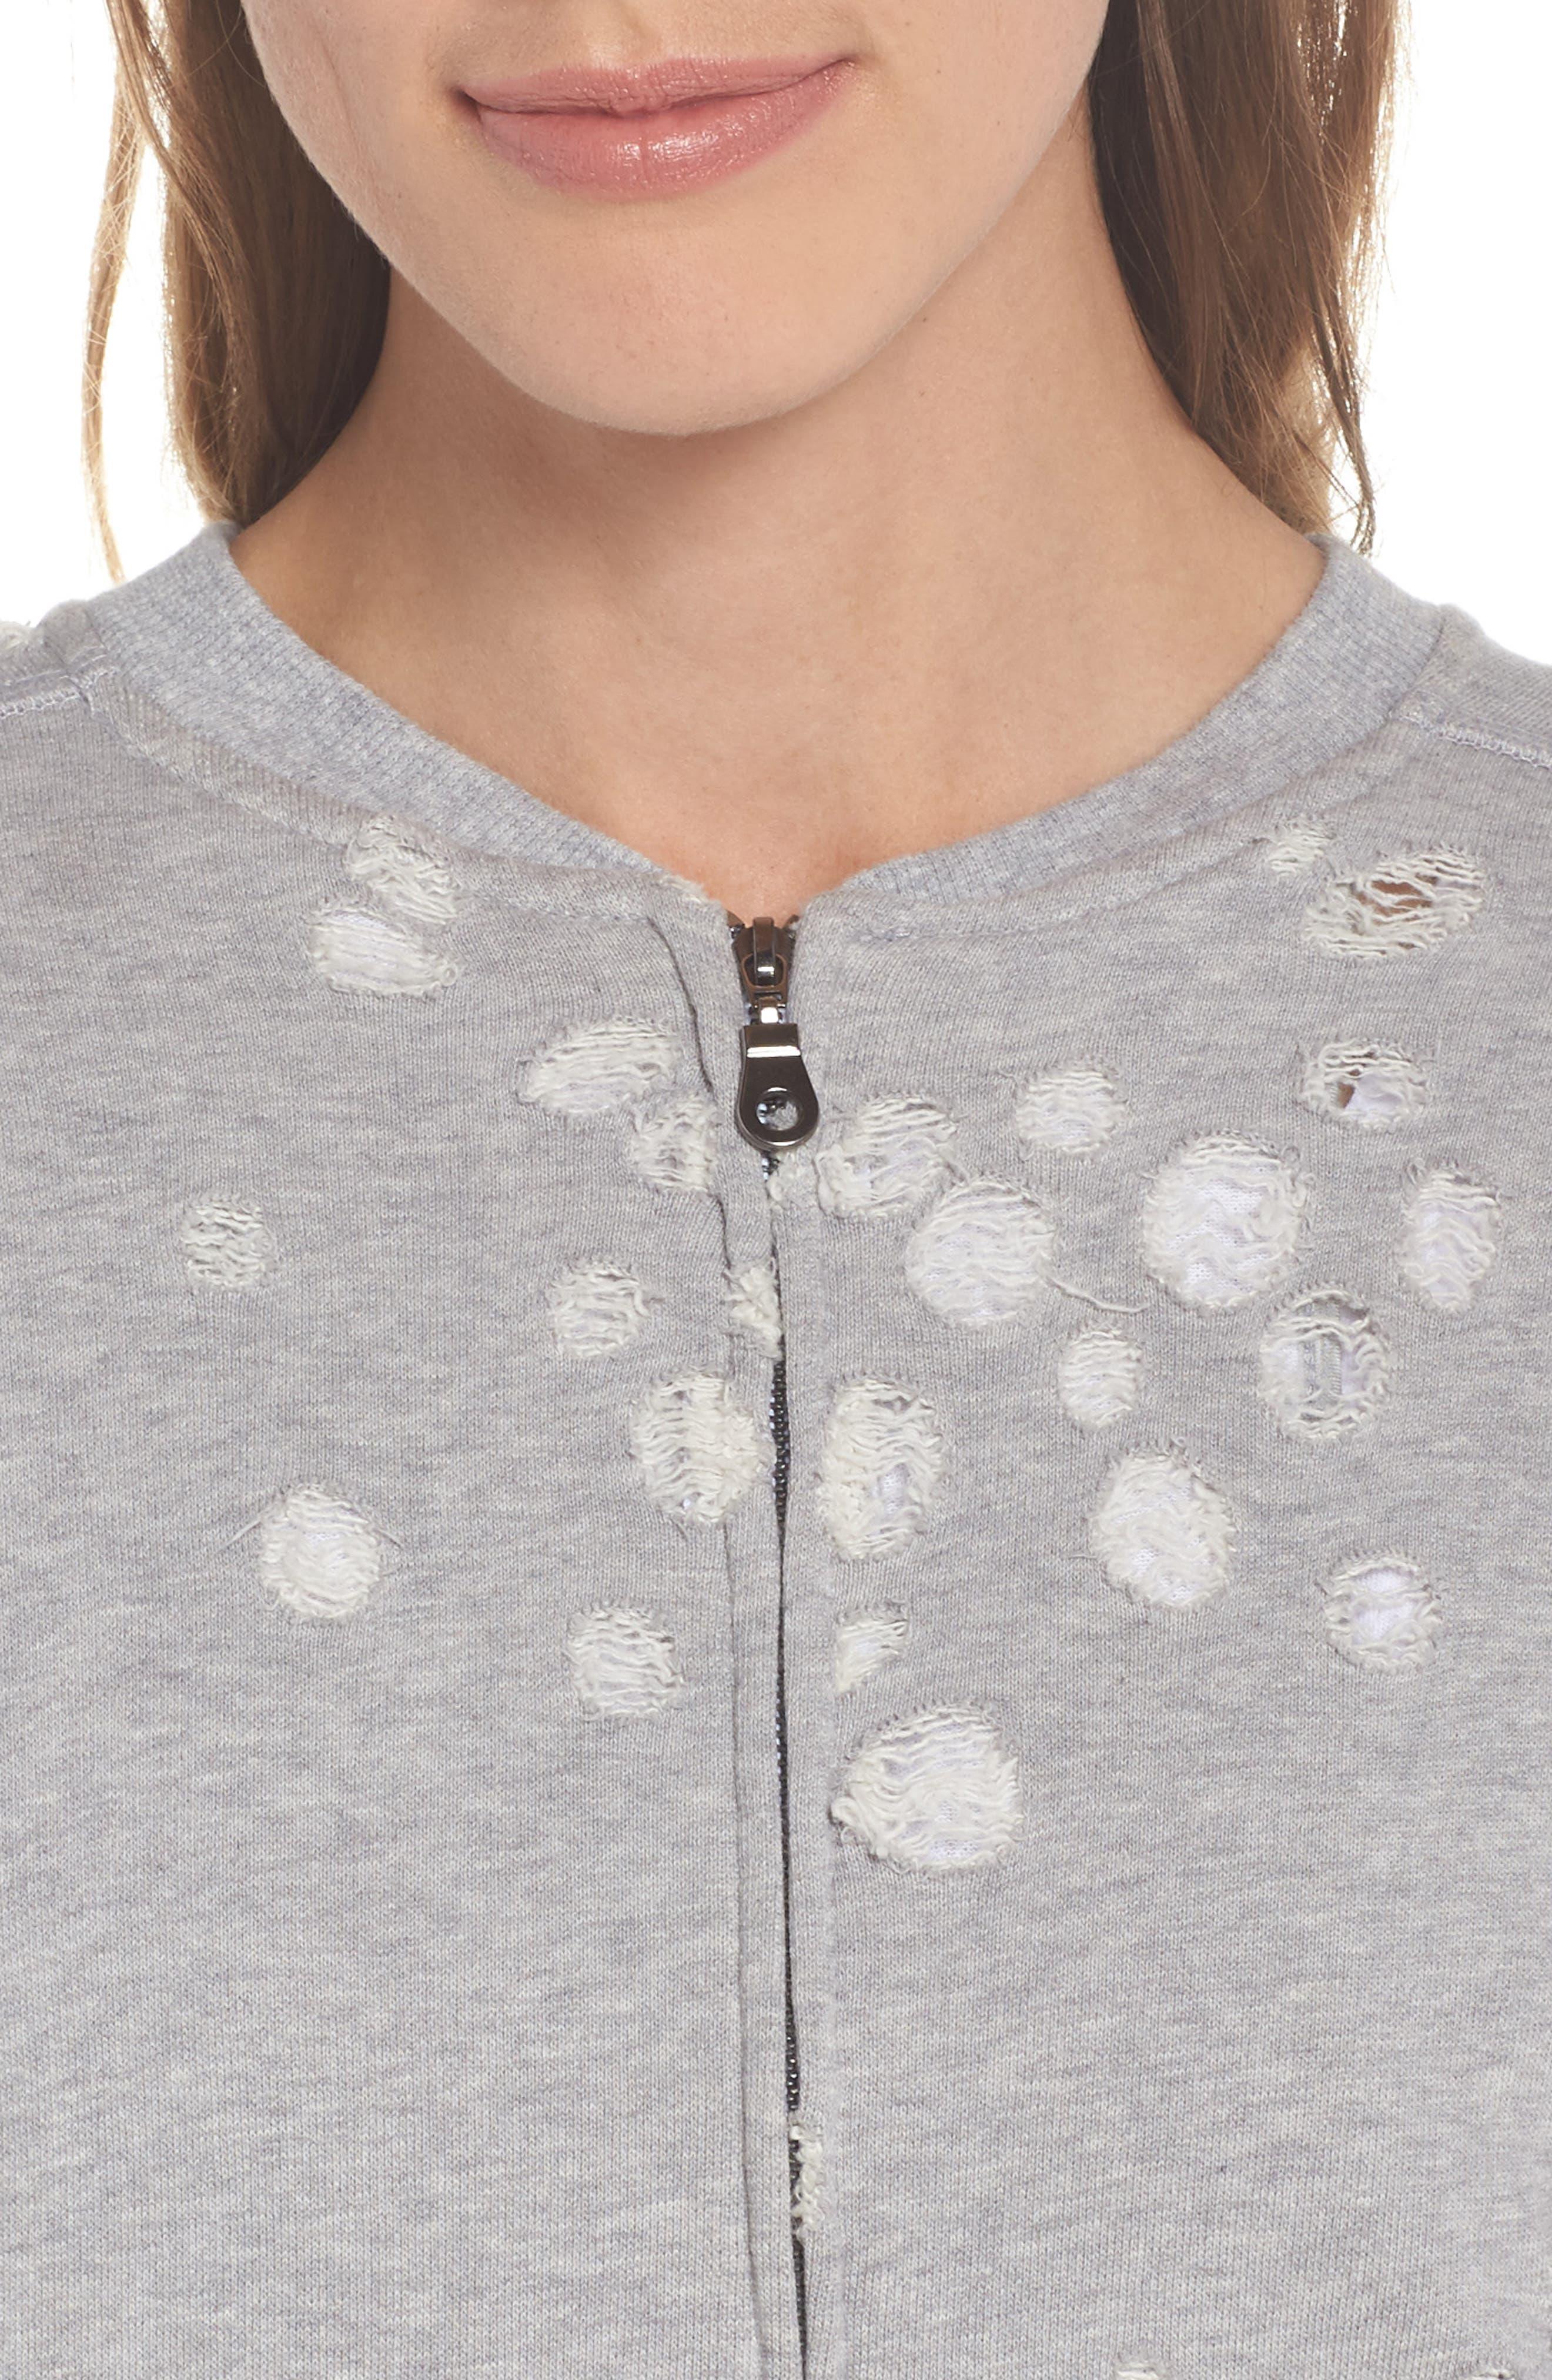 Distressed Zip Sweatshirt,                             Alternate thumbnail 4, color,                             HEATHER GREY